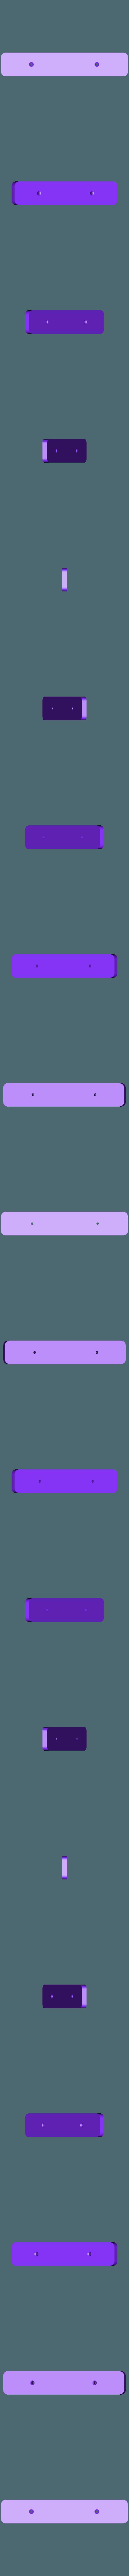 Support-3troux-percé.stl Download free STL file Modular reminder • 3D print template, rfbat